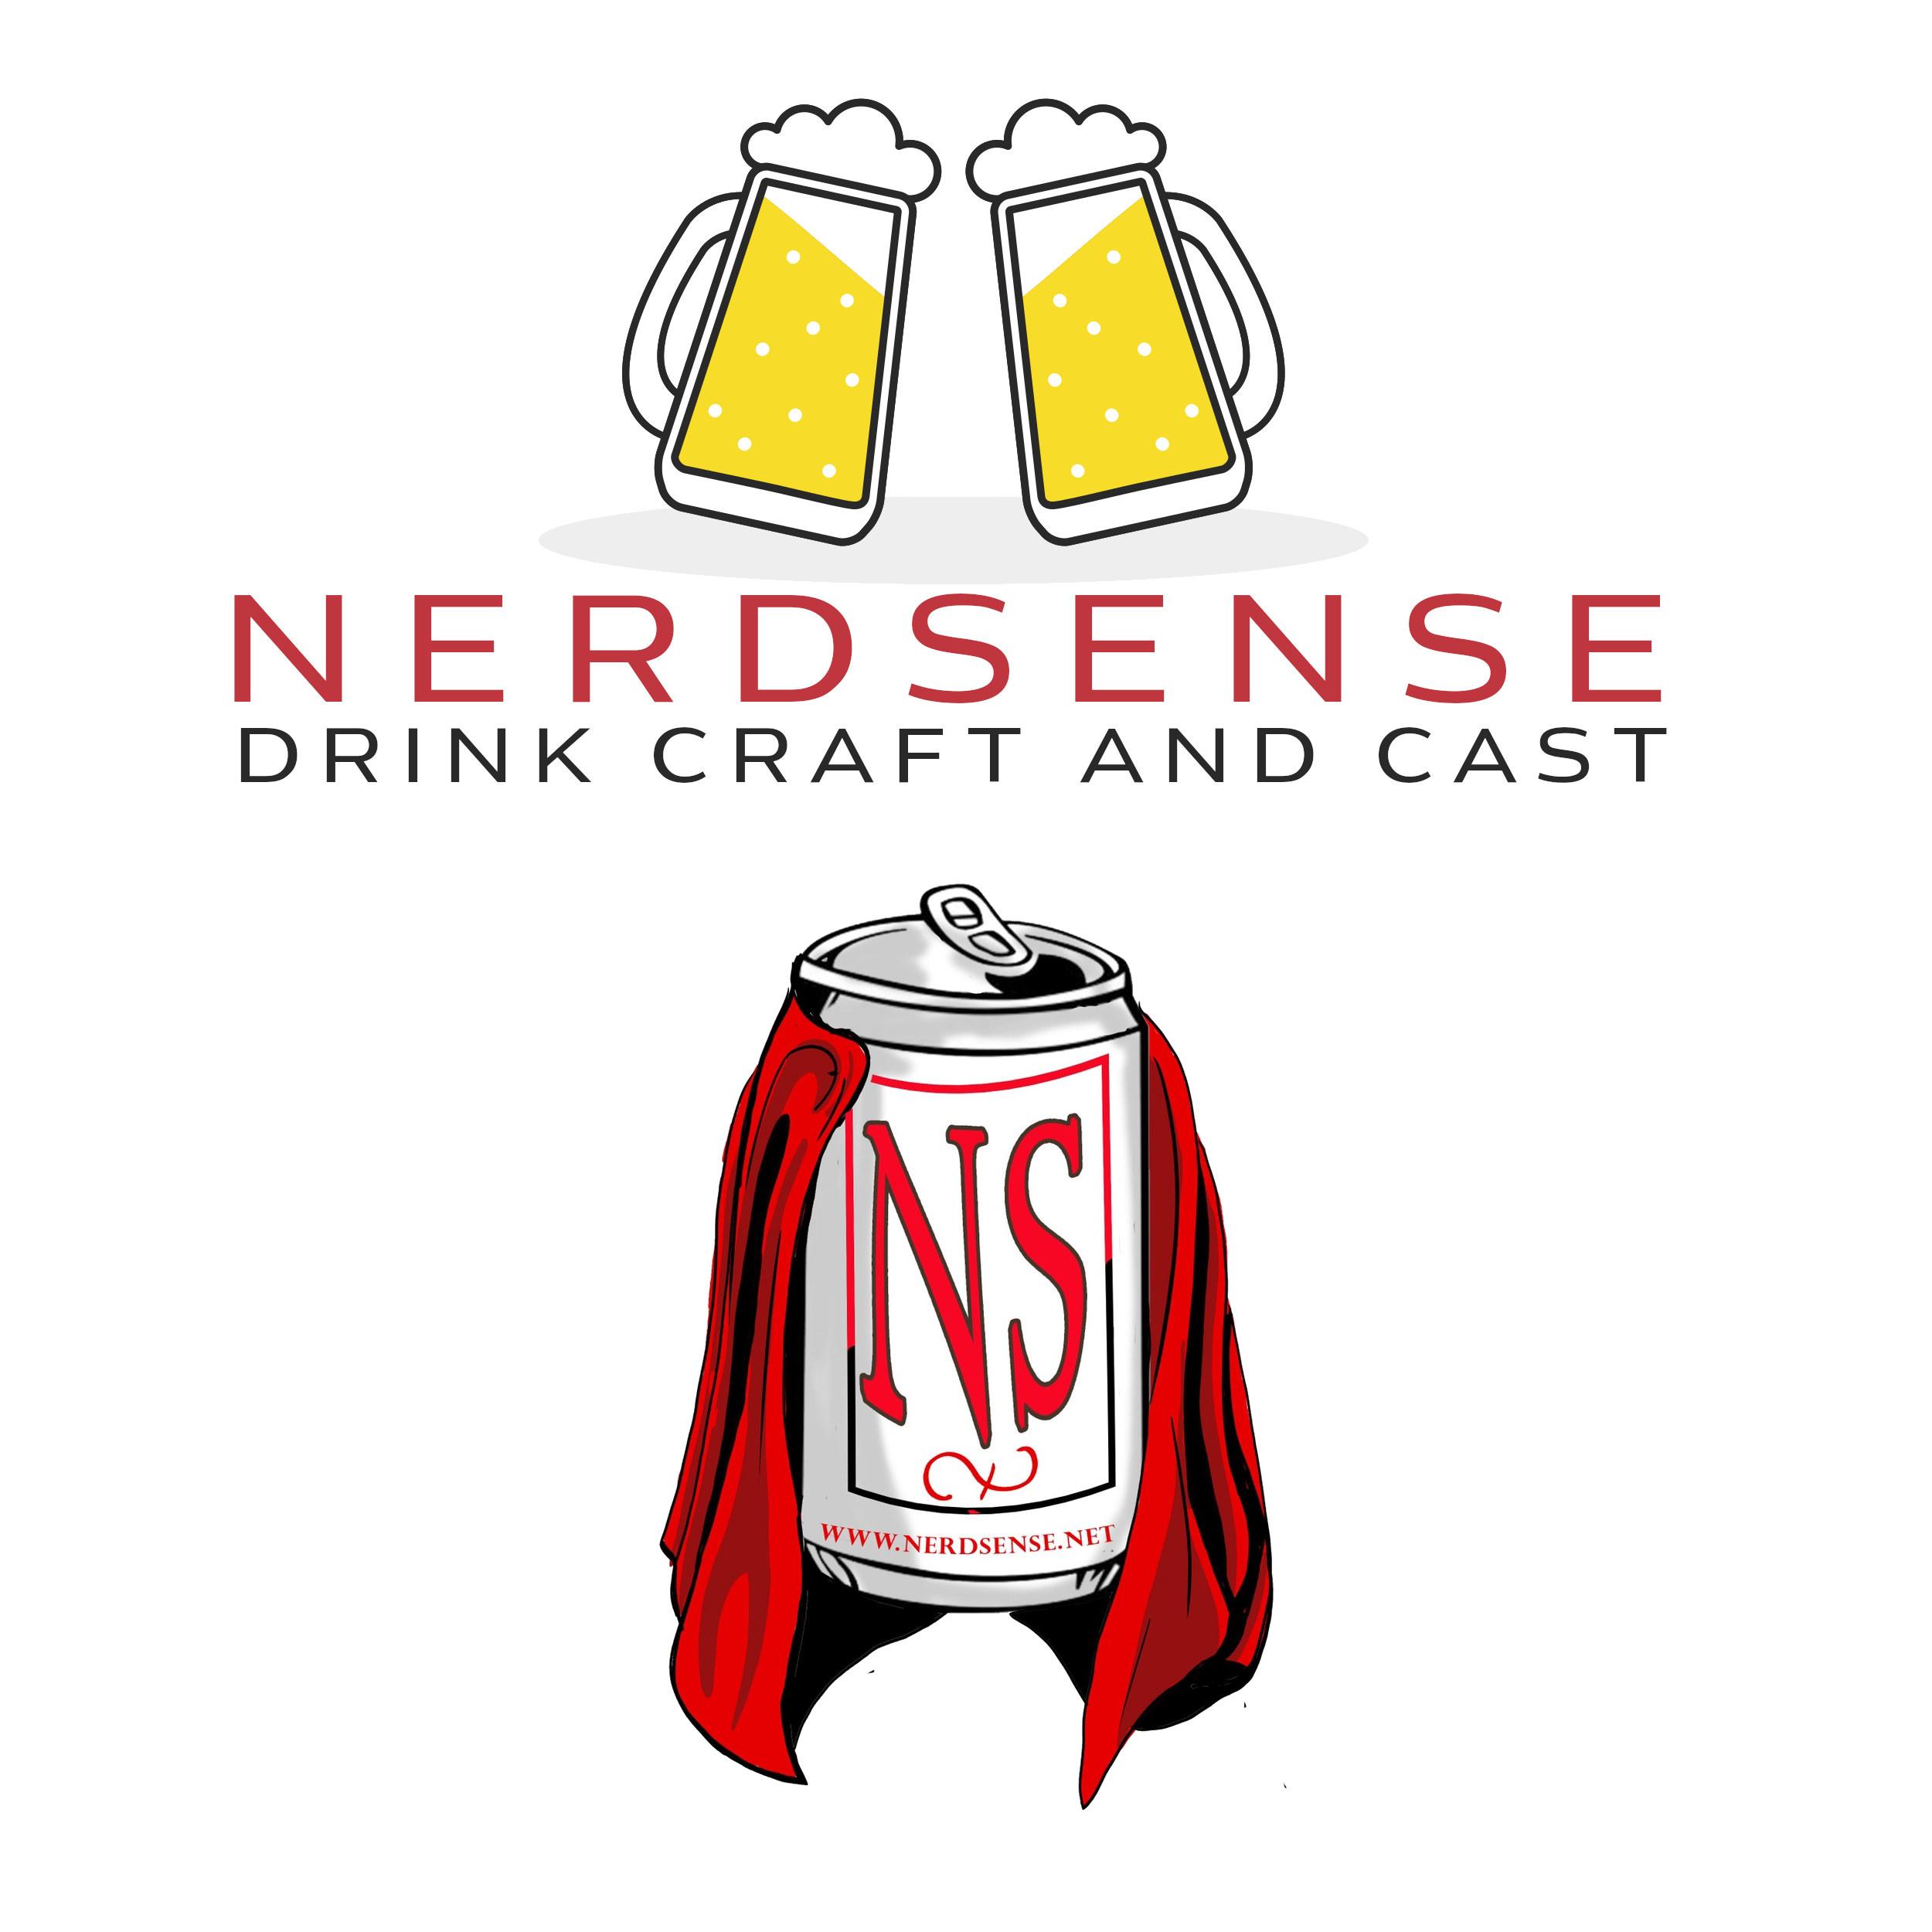 Nerdsense